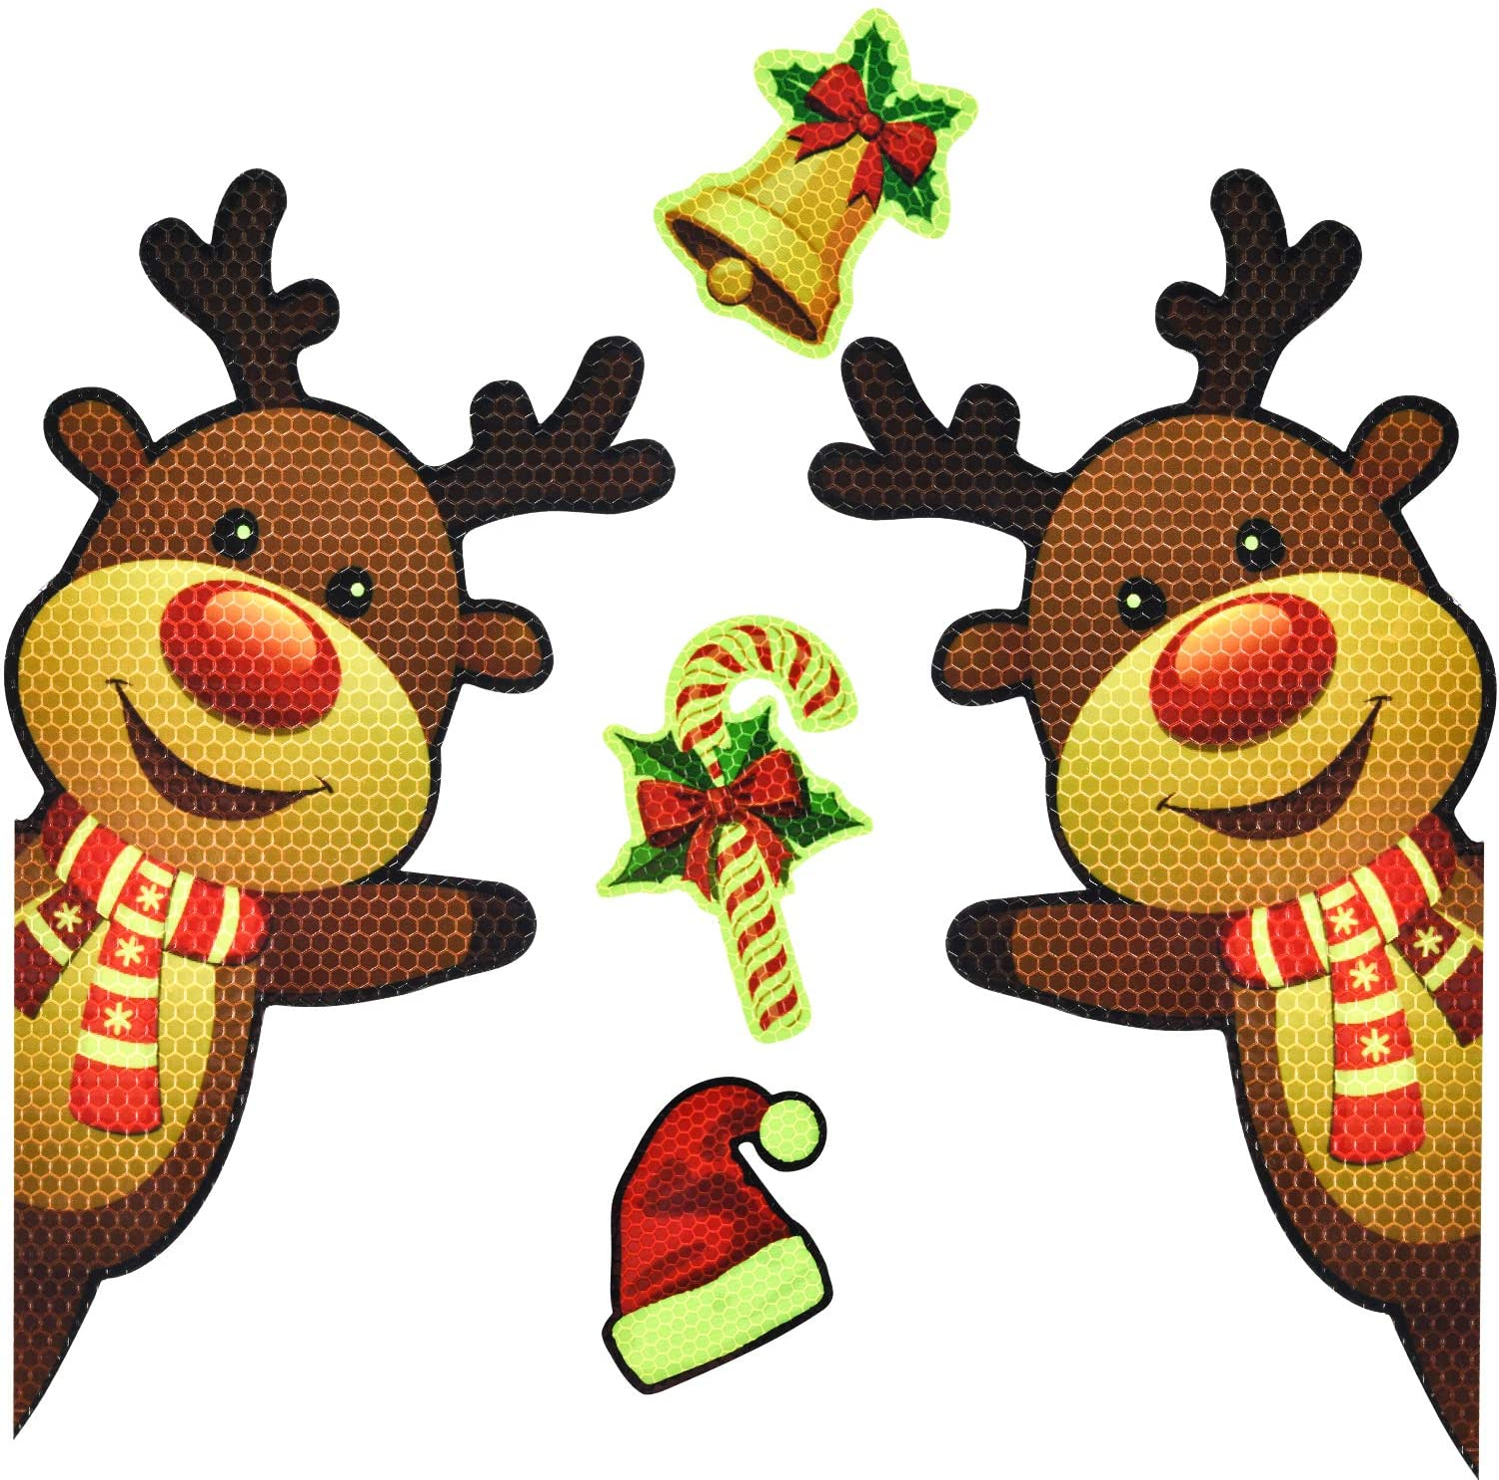 Bright Reflective Merry Christmas car Magnet Decorations Set,JumboWaving Reindeer Car Magnet Reflective Decal for Car Fridge Garage Mailbox Vehicle Truck Xmas Holiday Décor(Waving Reindeer), 5pack